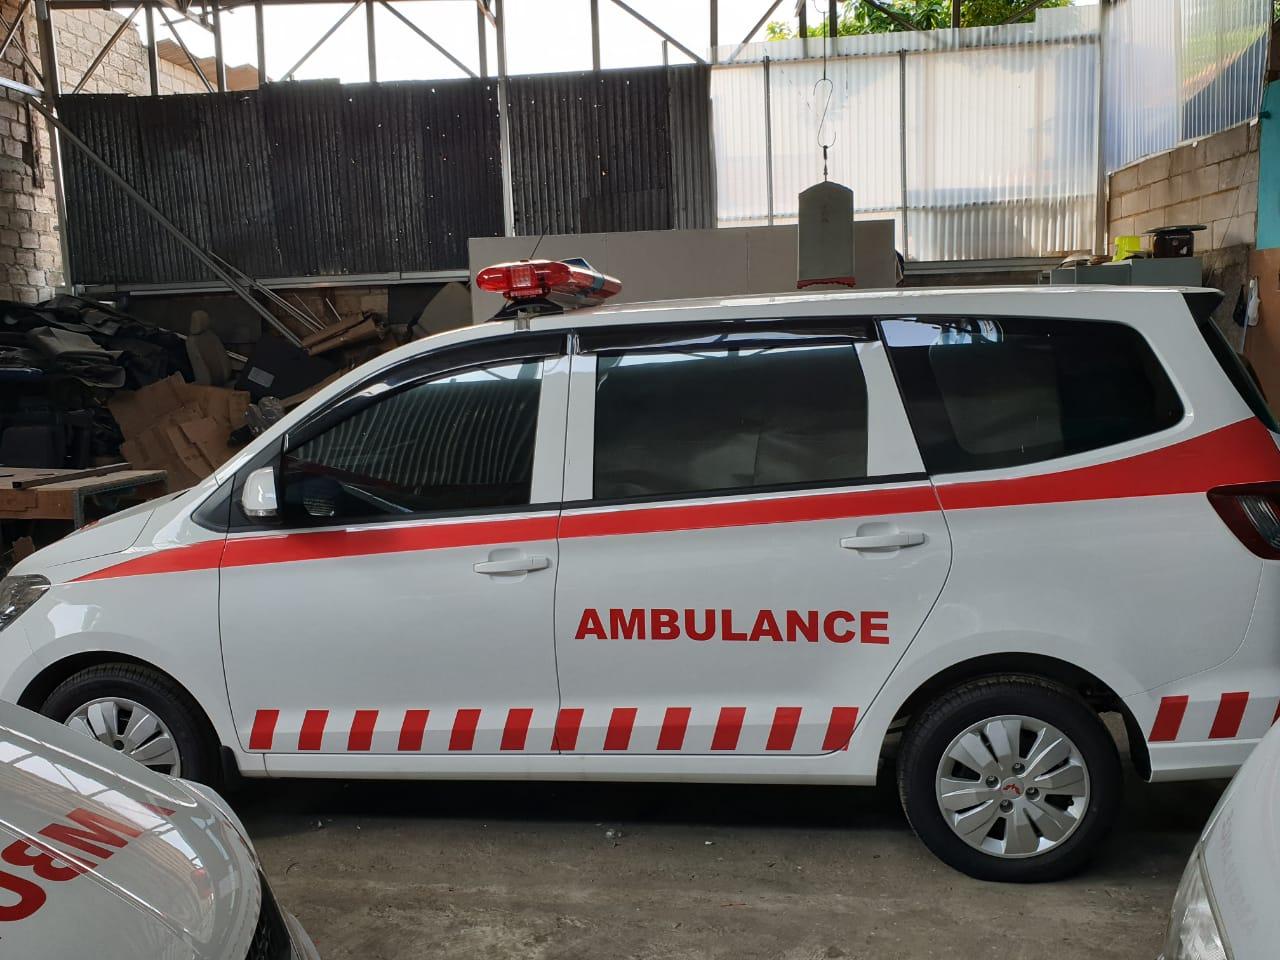 proses pembuatan ambulance tercepat